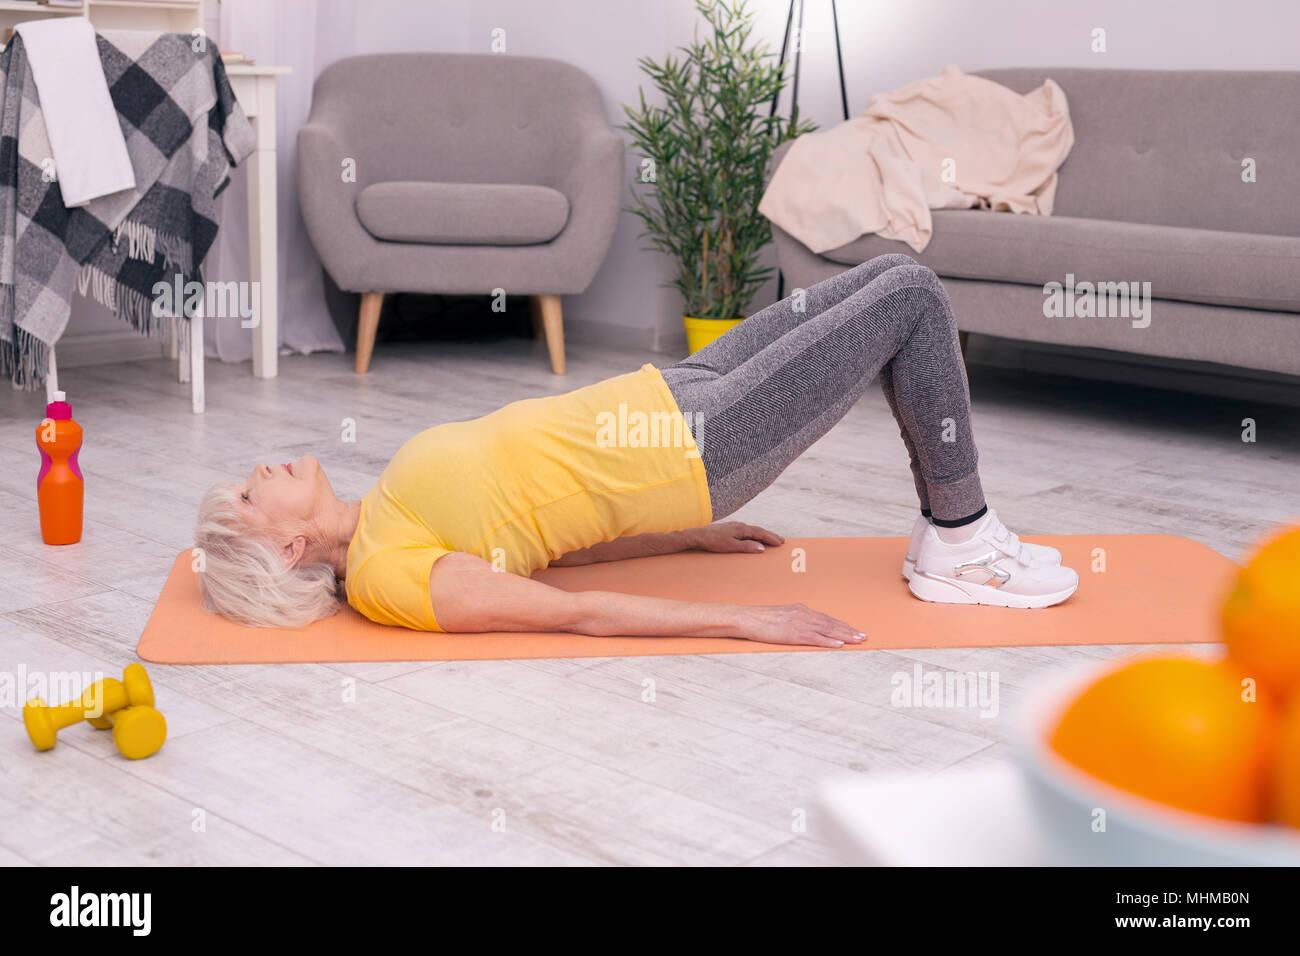 Pleasant elderly woman performing pelvic lift exercise - Stock Image